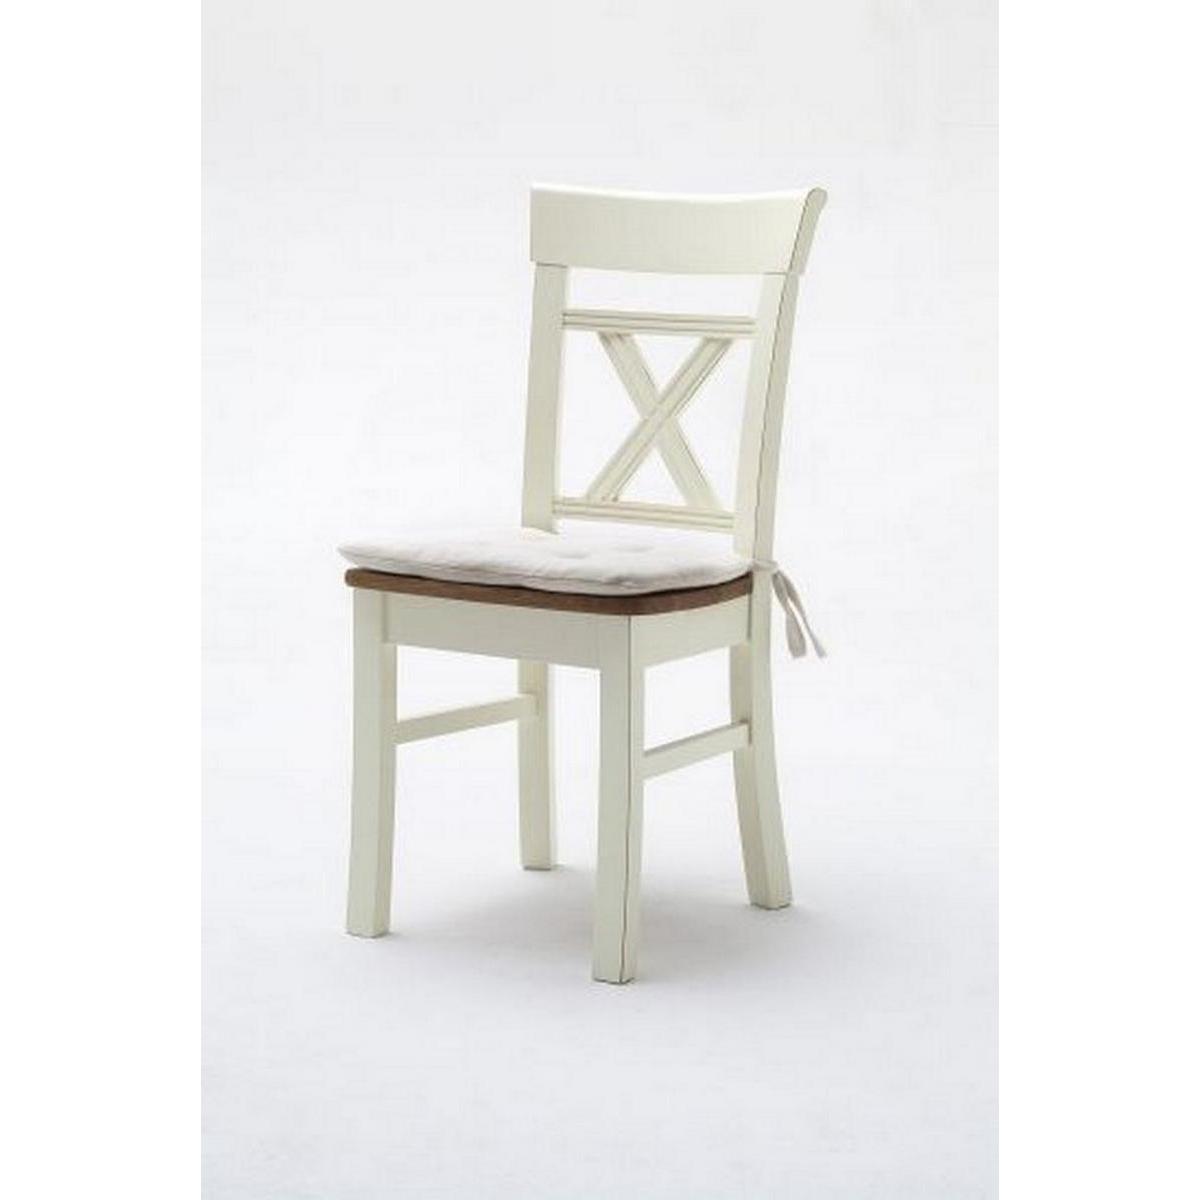 massivholz stuhl mit sitzkissen nordic home kiefer massiv wei lackiert wildeiche ge lt. Black Bedroom Furniture Sets. Home Design Ideas